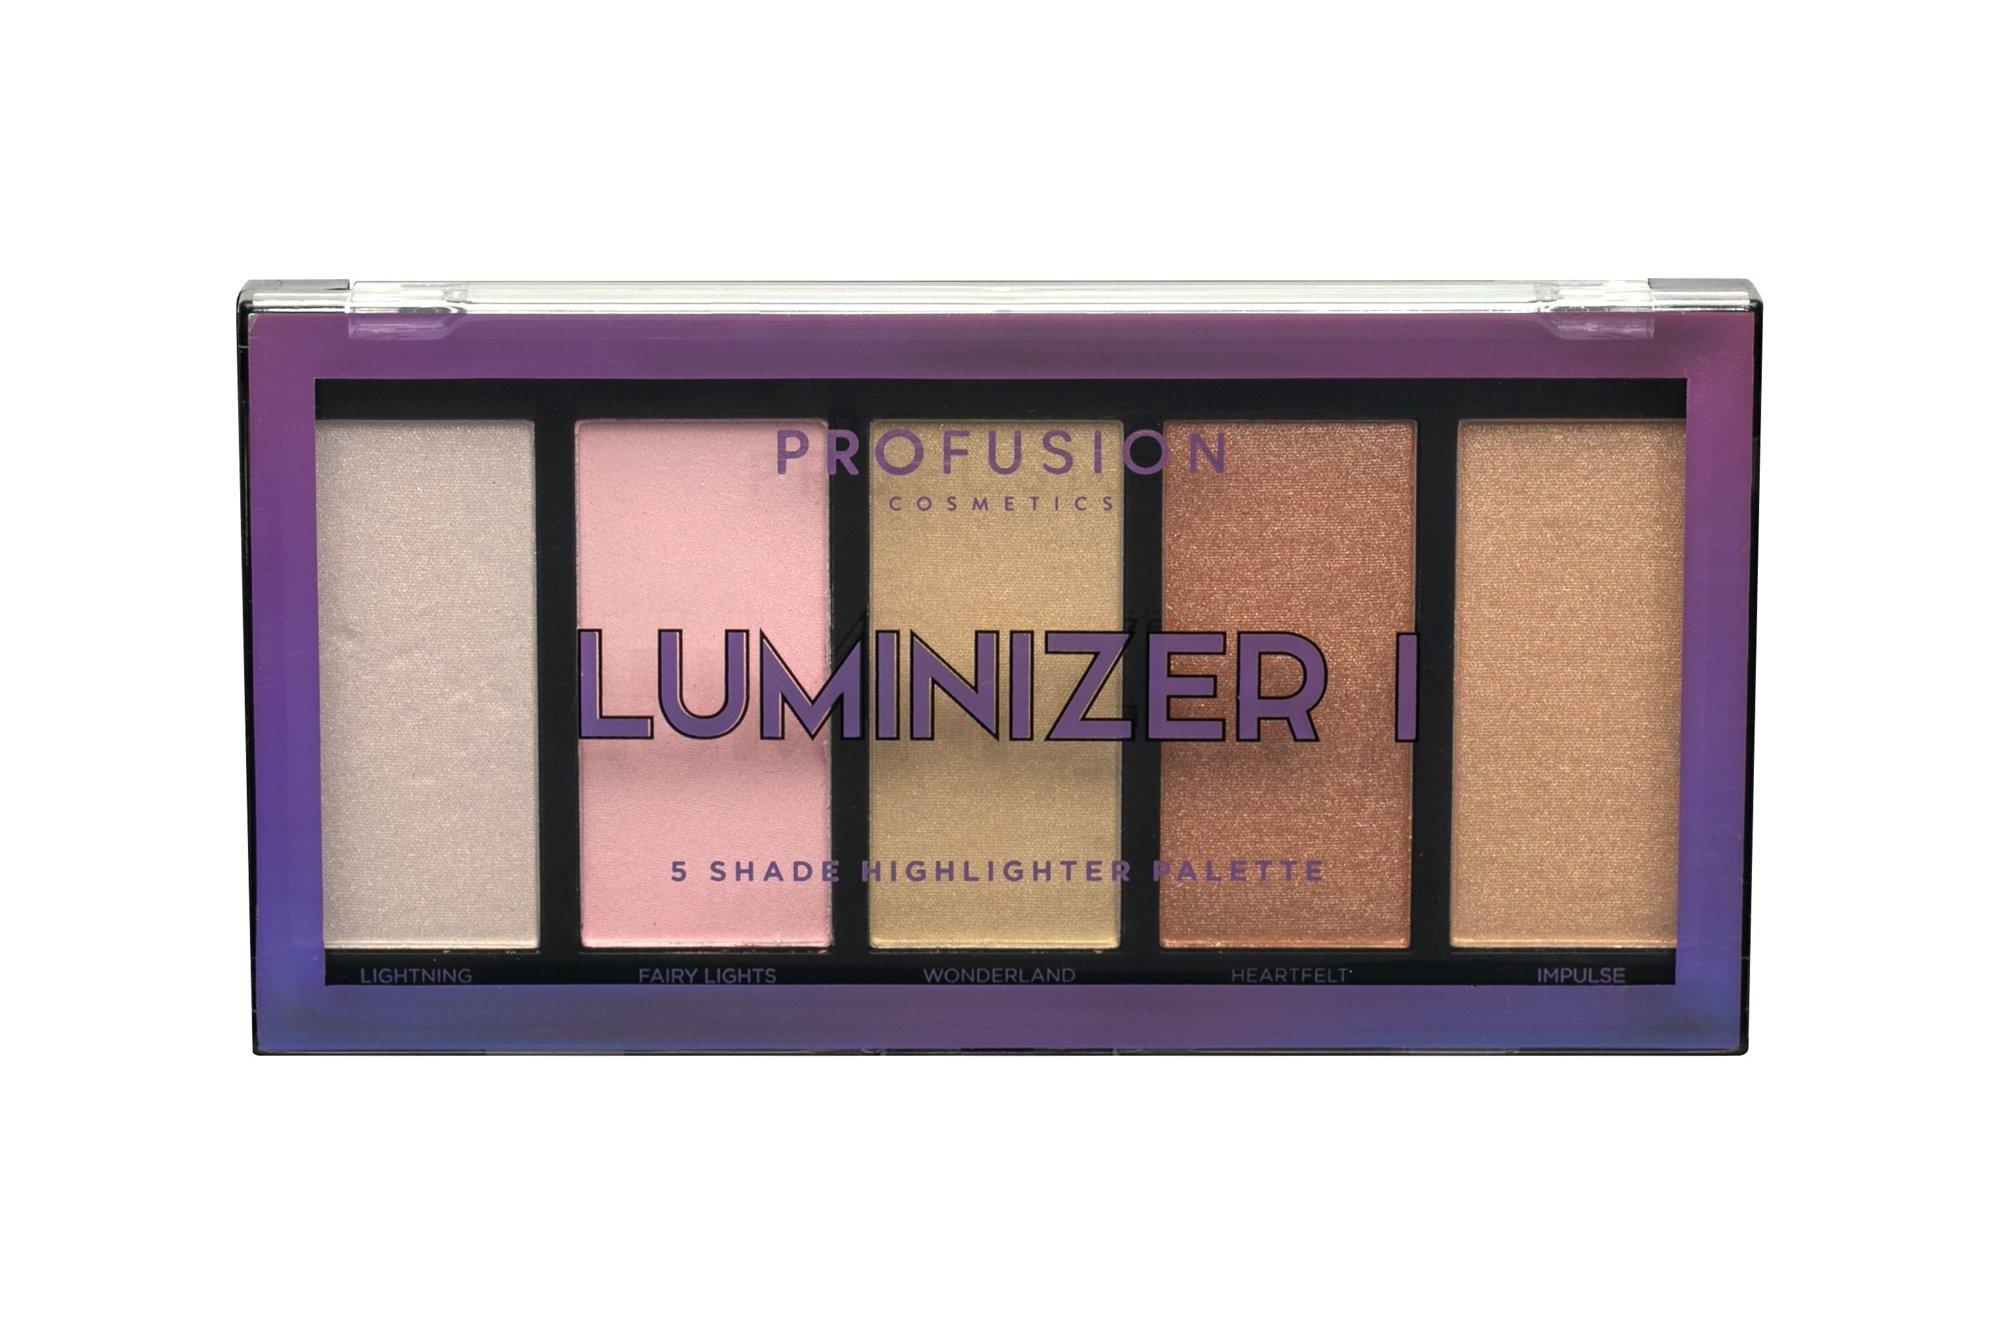 Profusion Luminizer Brightener 20ml